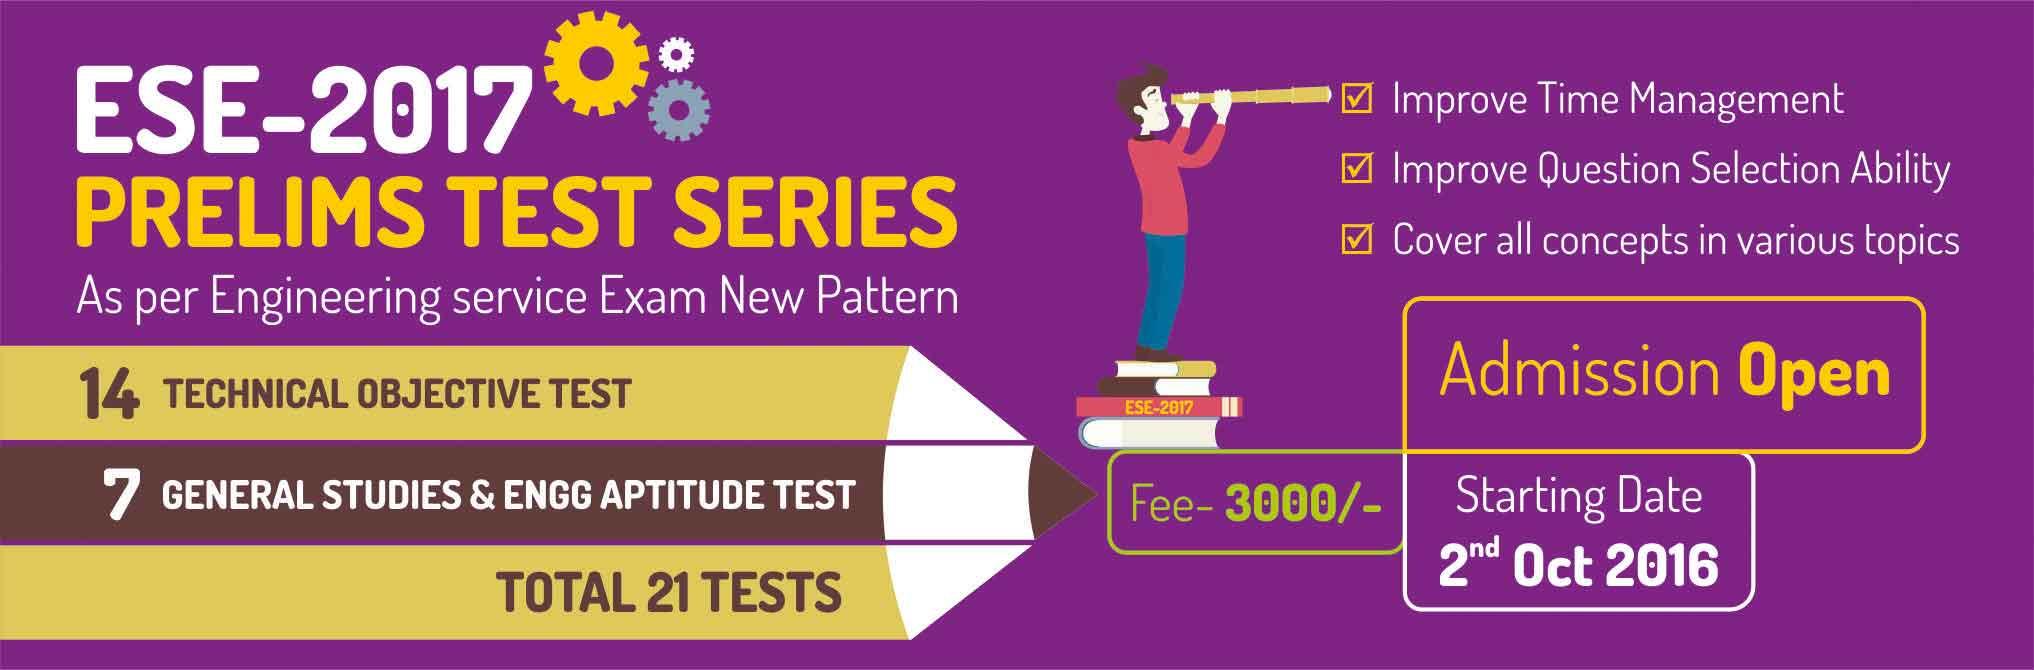 IES Master ESE Test Series 2017